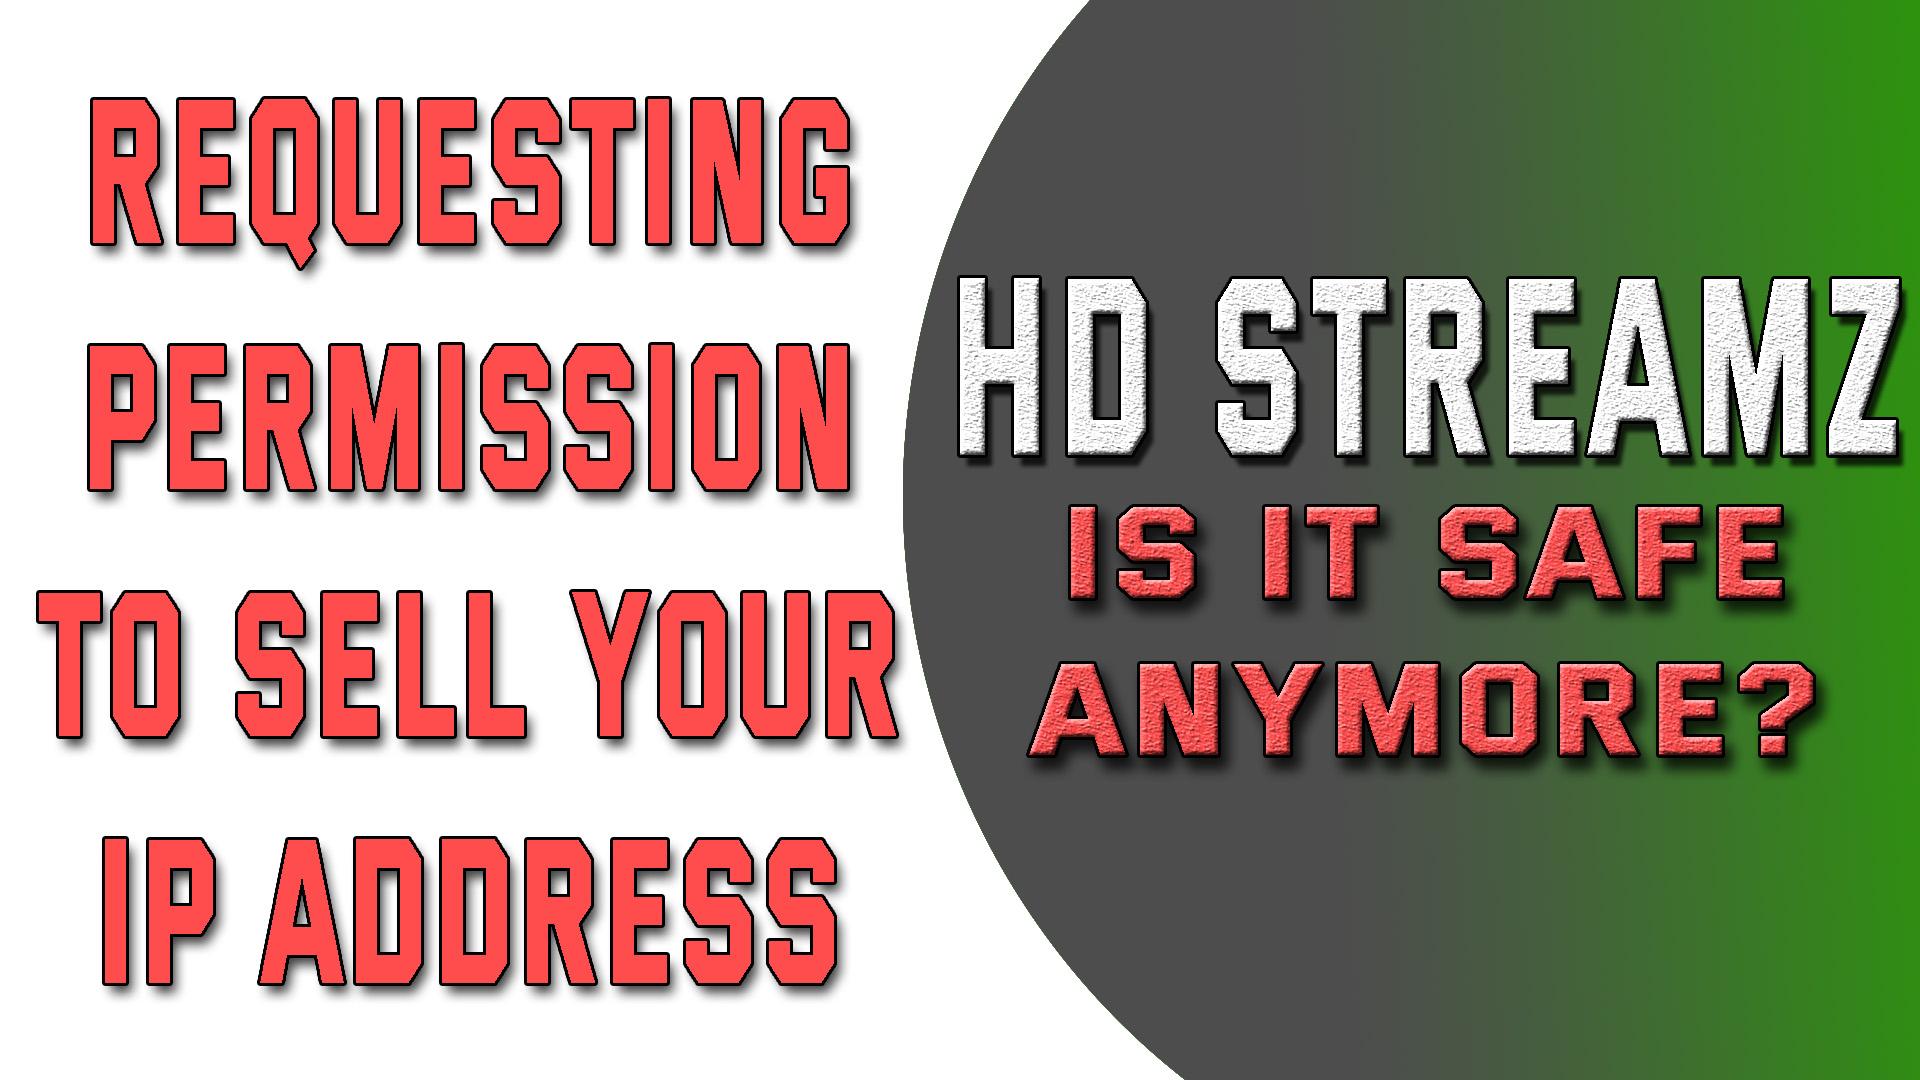 HD Streamz Isn't Safe